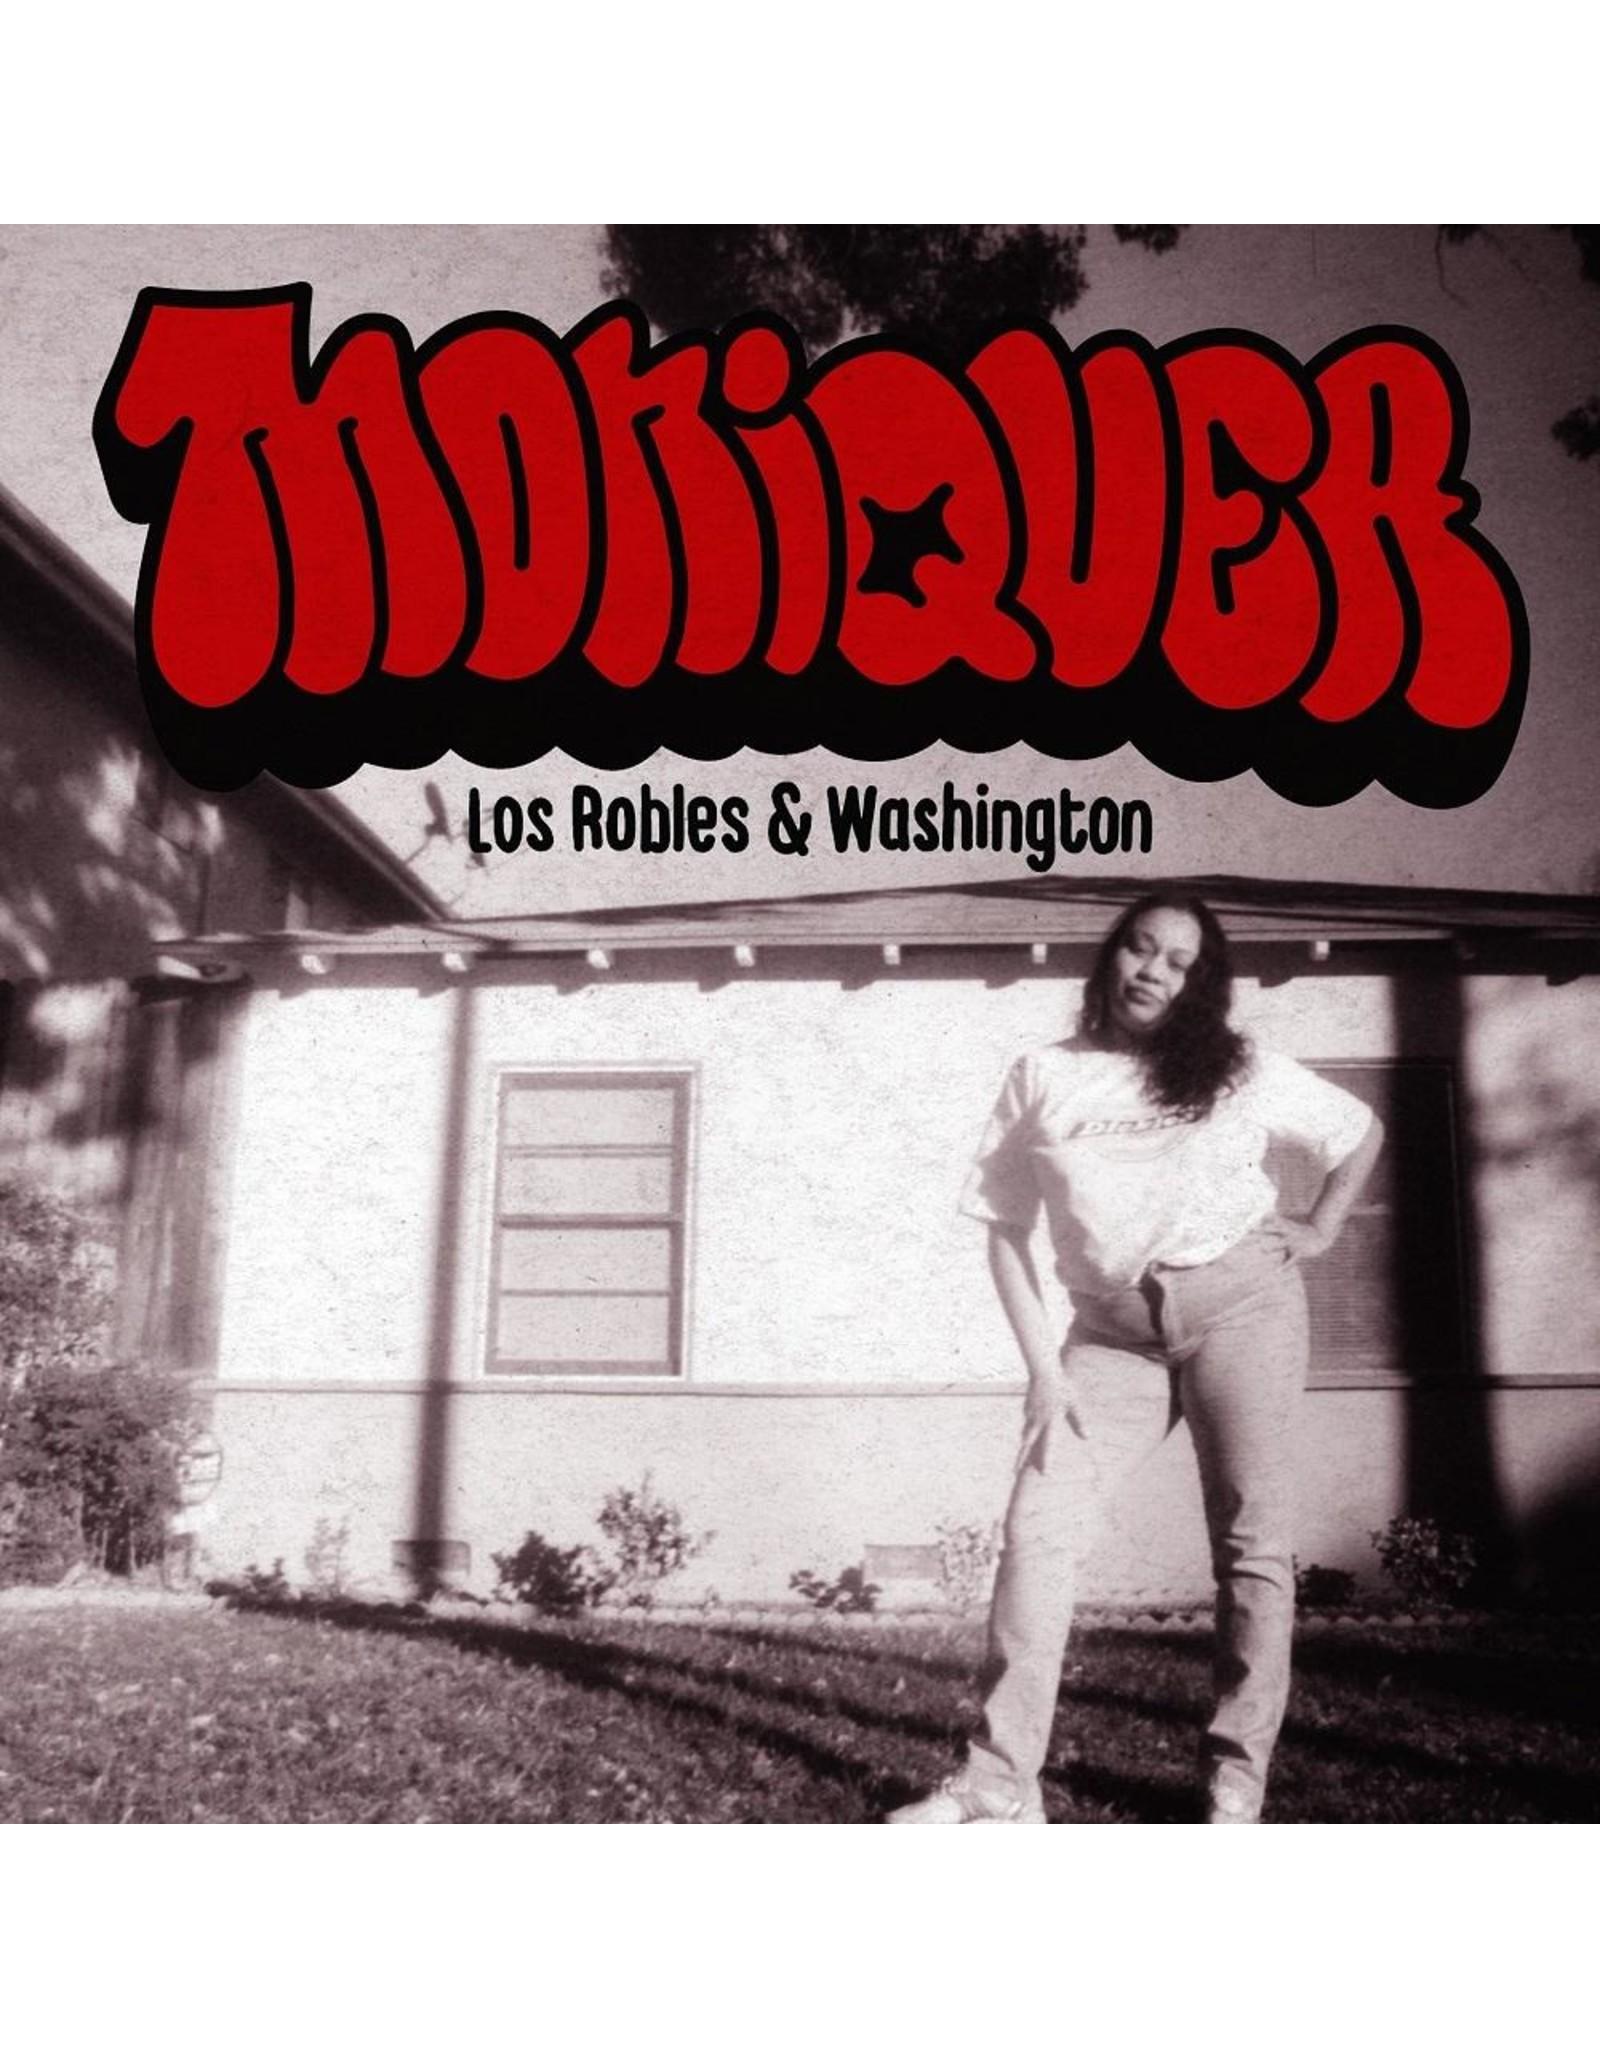 Moniquea - Los Robles & Washington LP